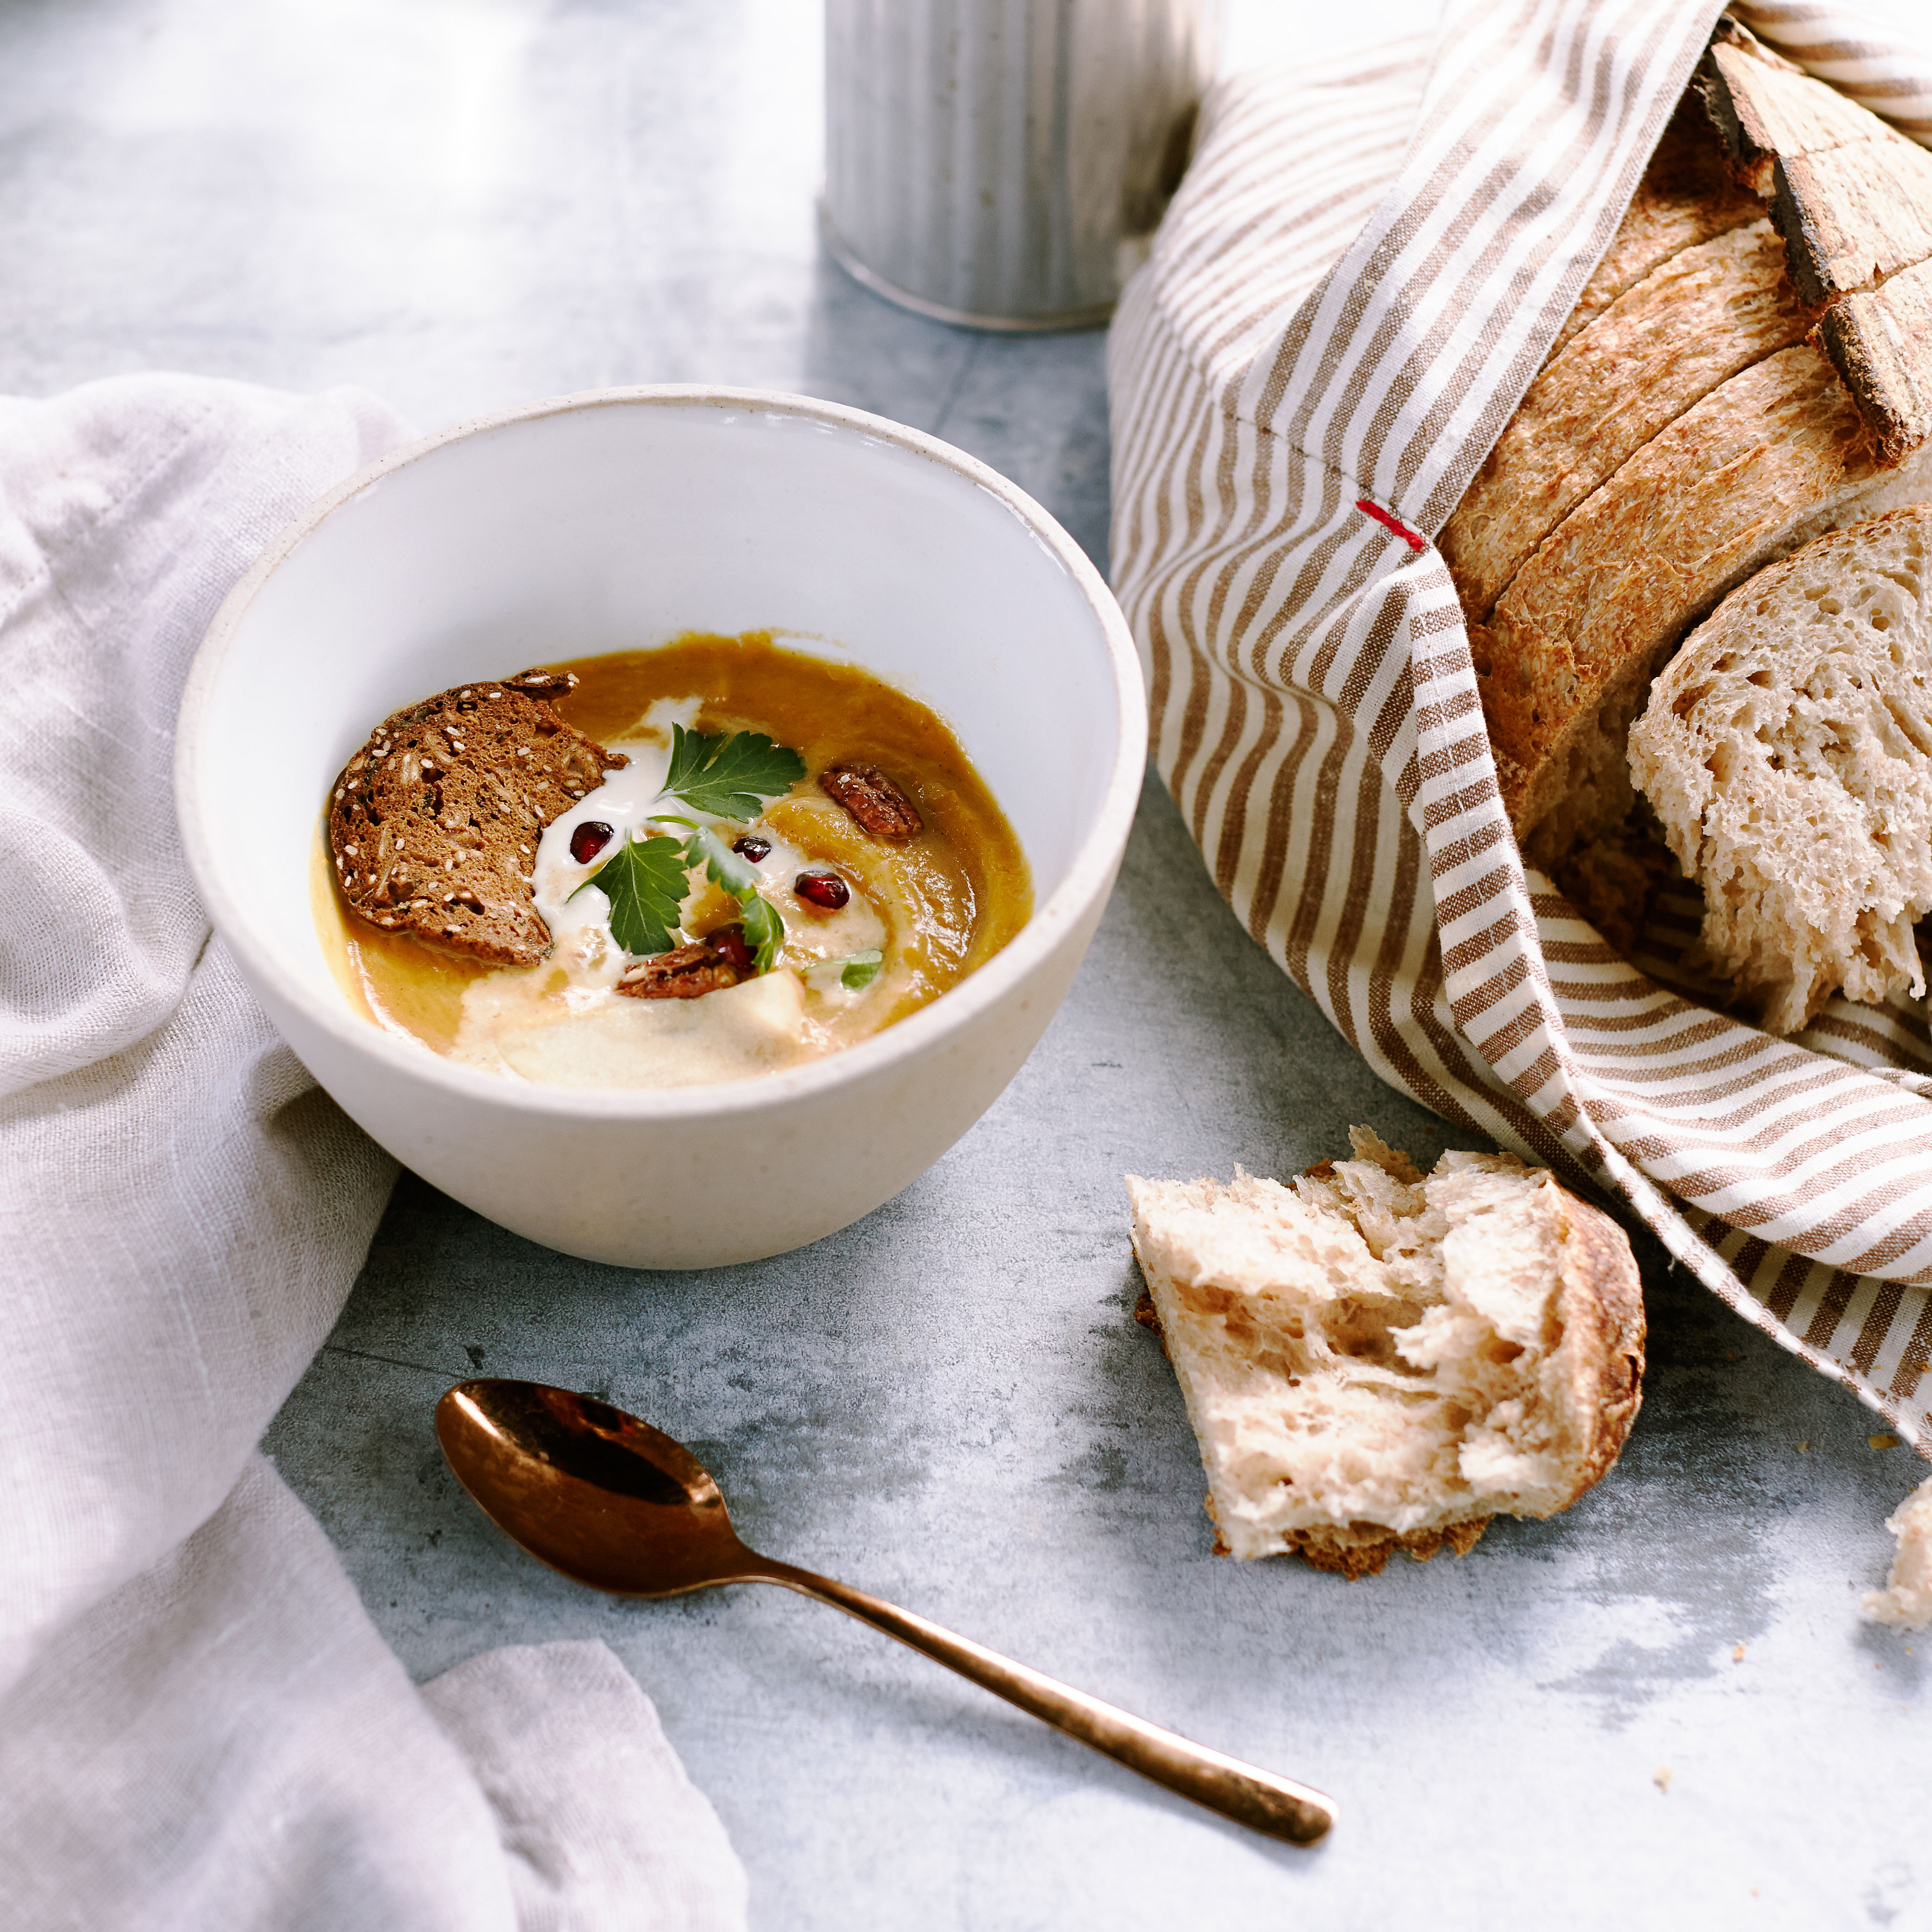 su-Spiced Apple Butternut Squash Soup Image